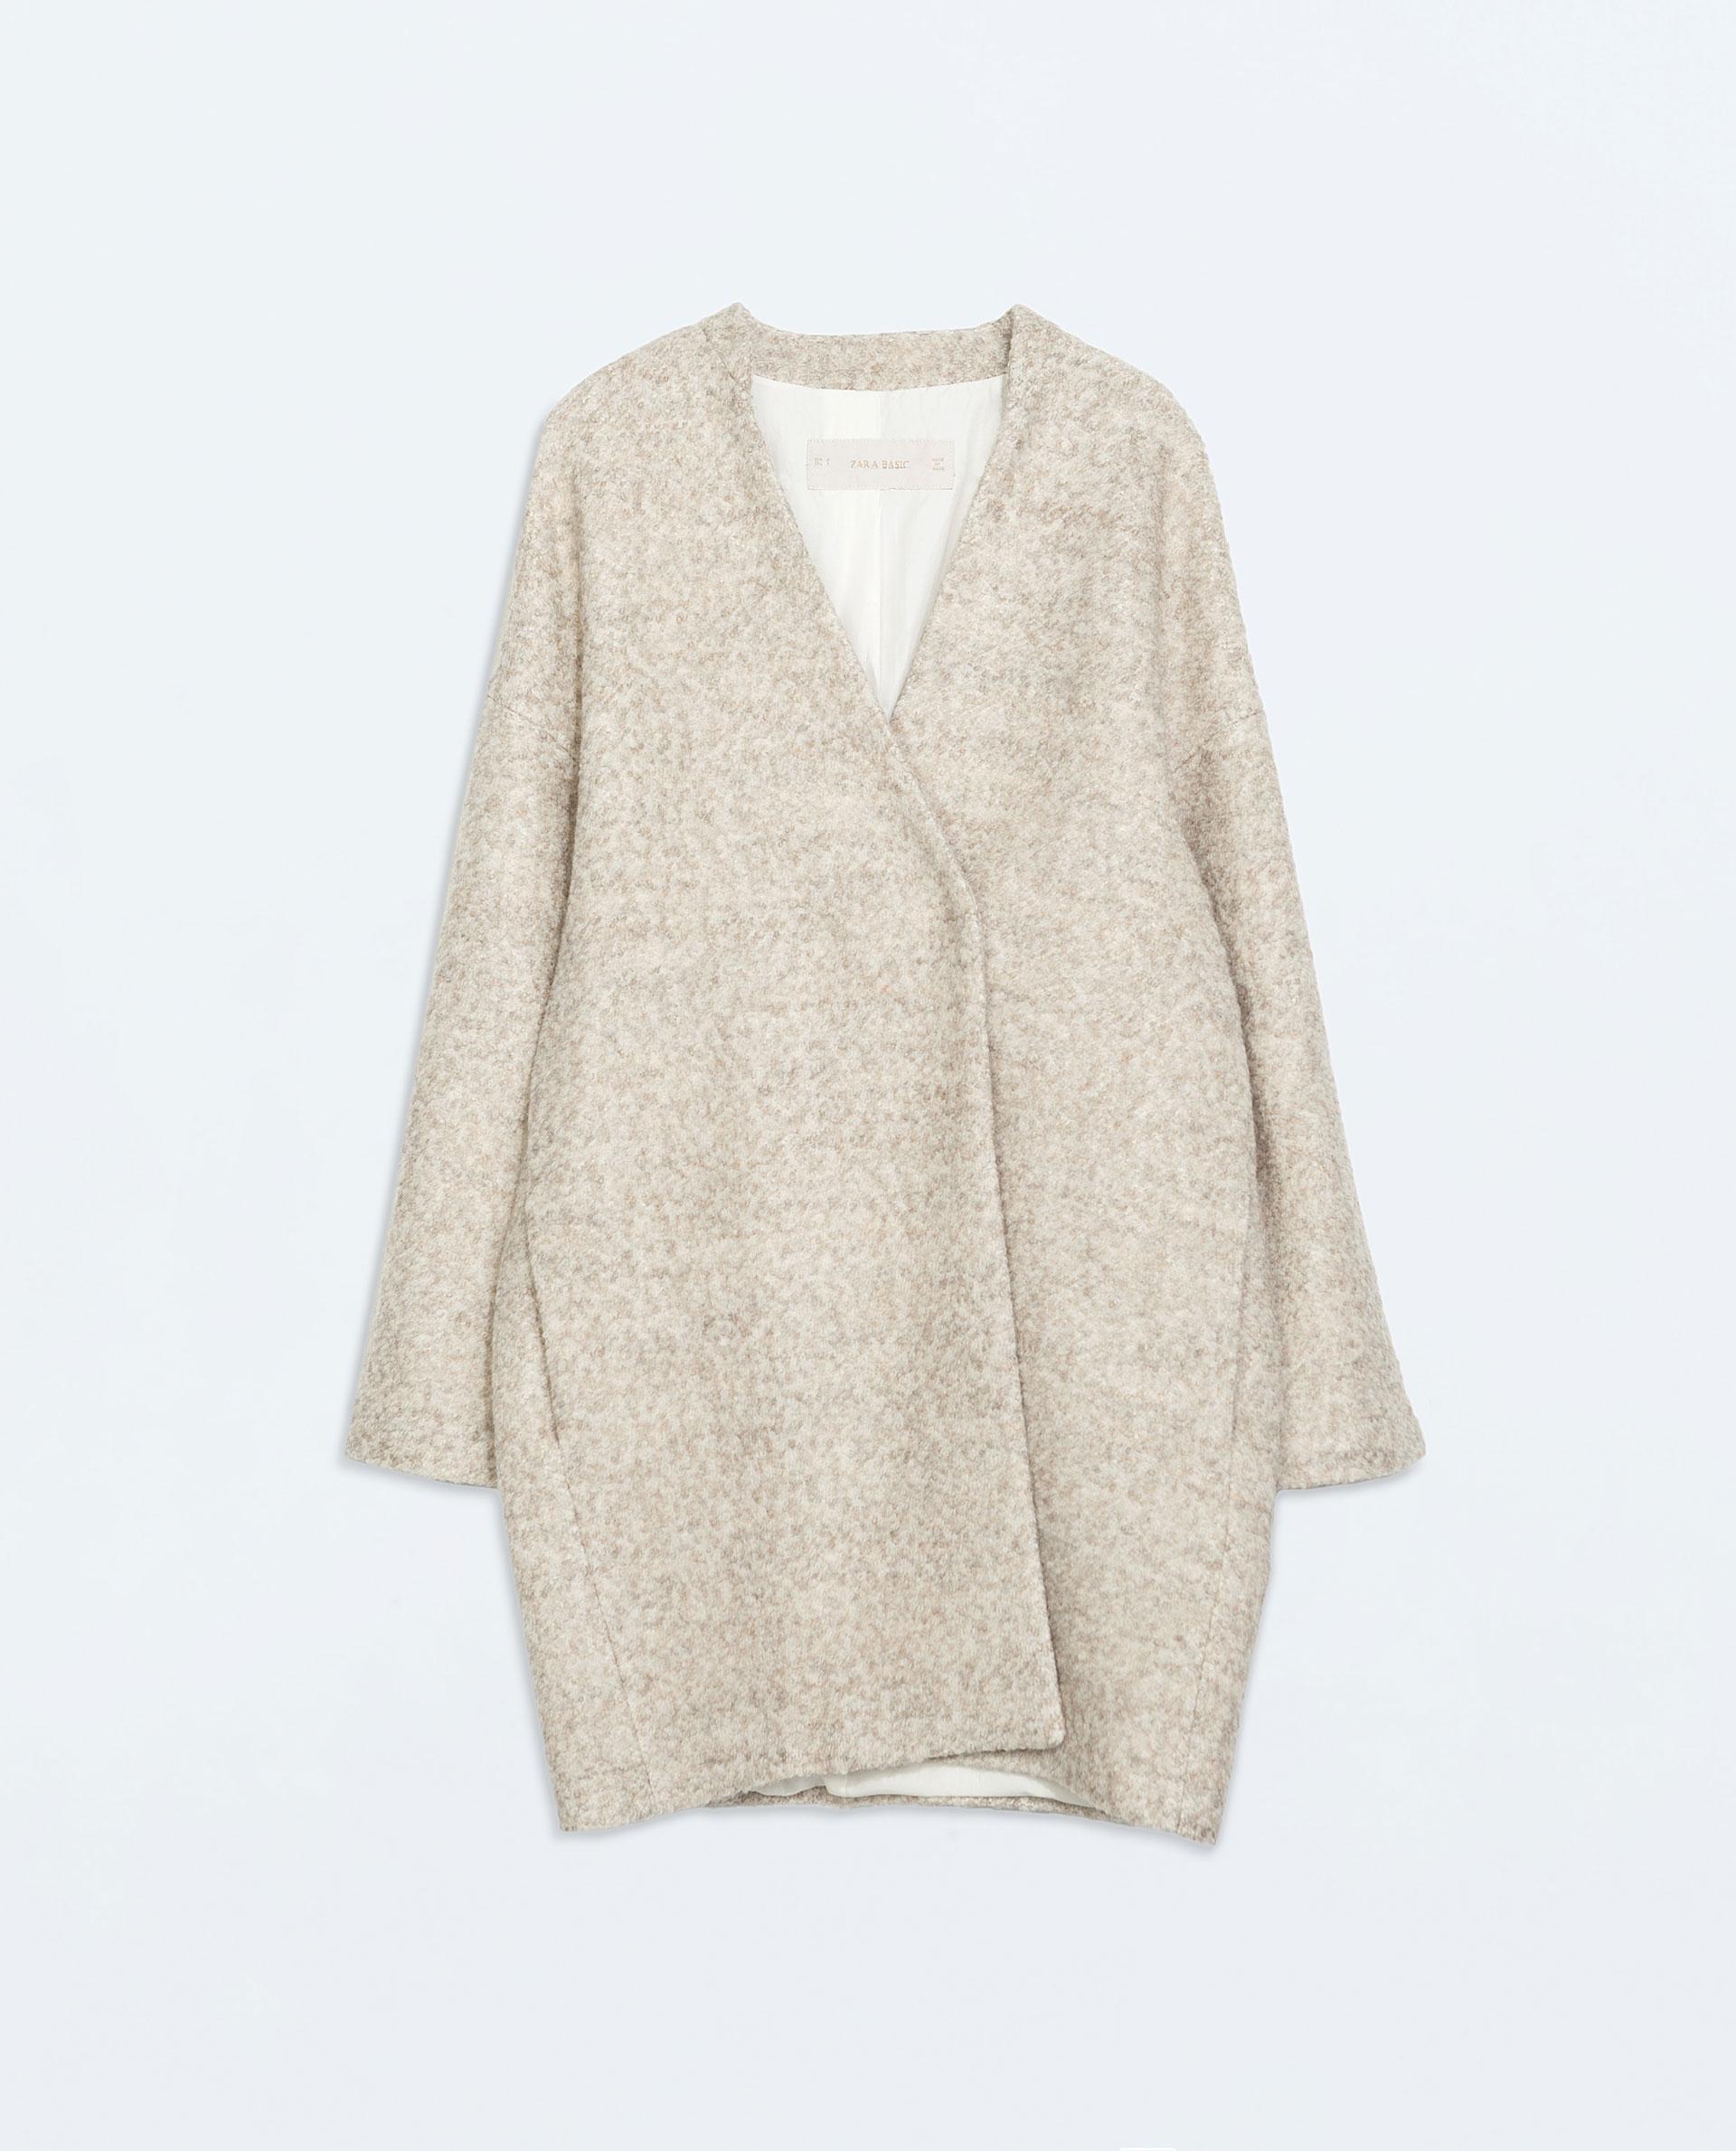 Zara Wool Coat in Natural | Lyst